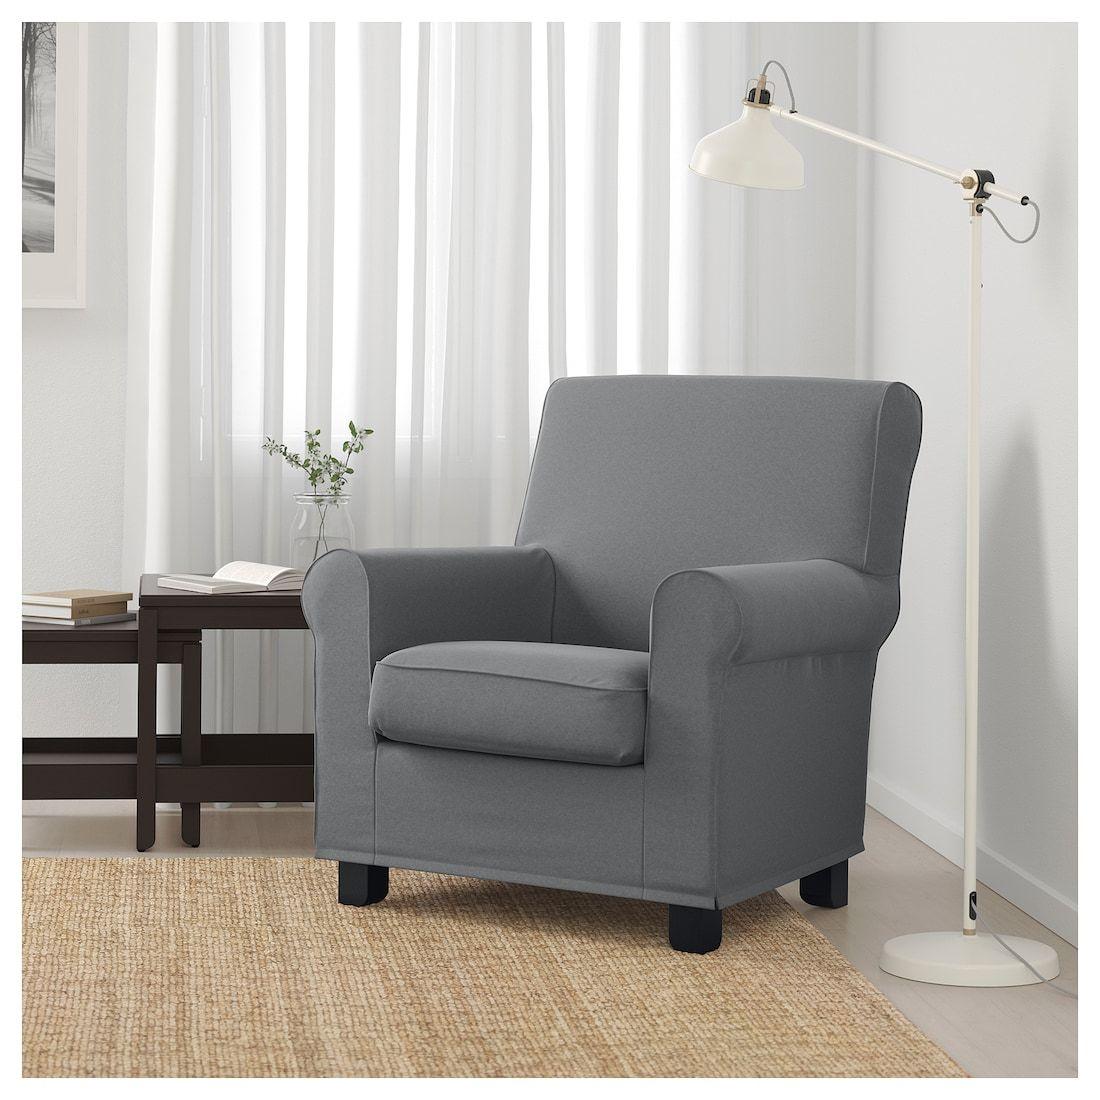 Gronlid Armchair Ljungen Medium Gray Ikea Fabric Armchairs Armchair Ikea Sofa Covers